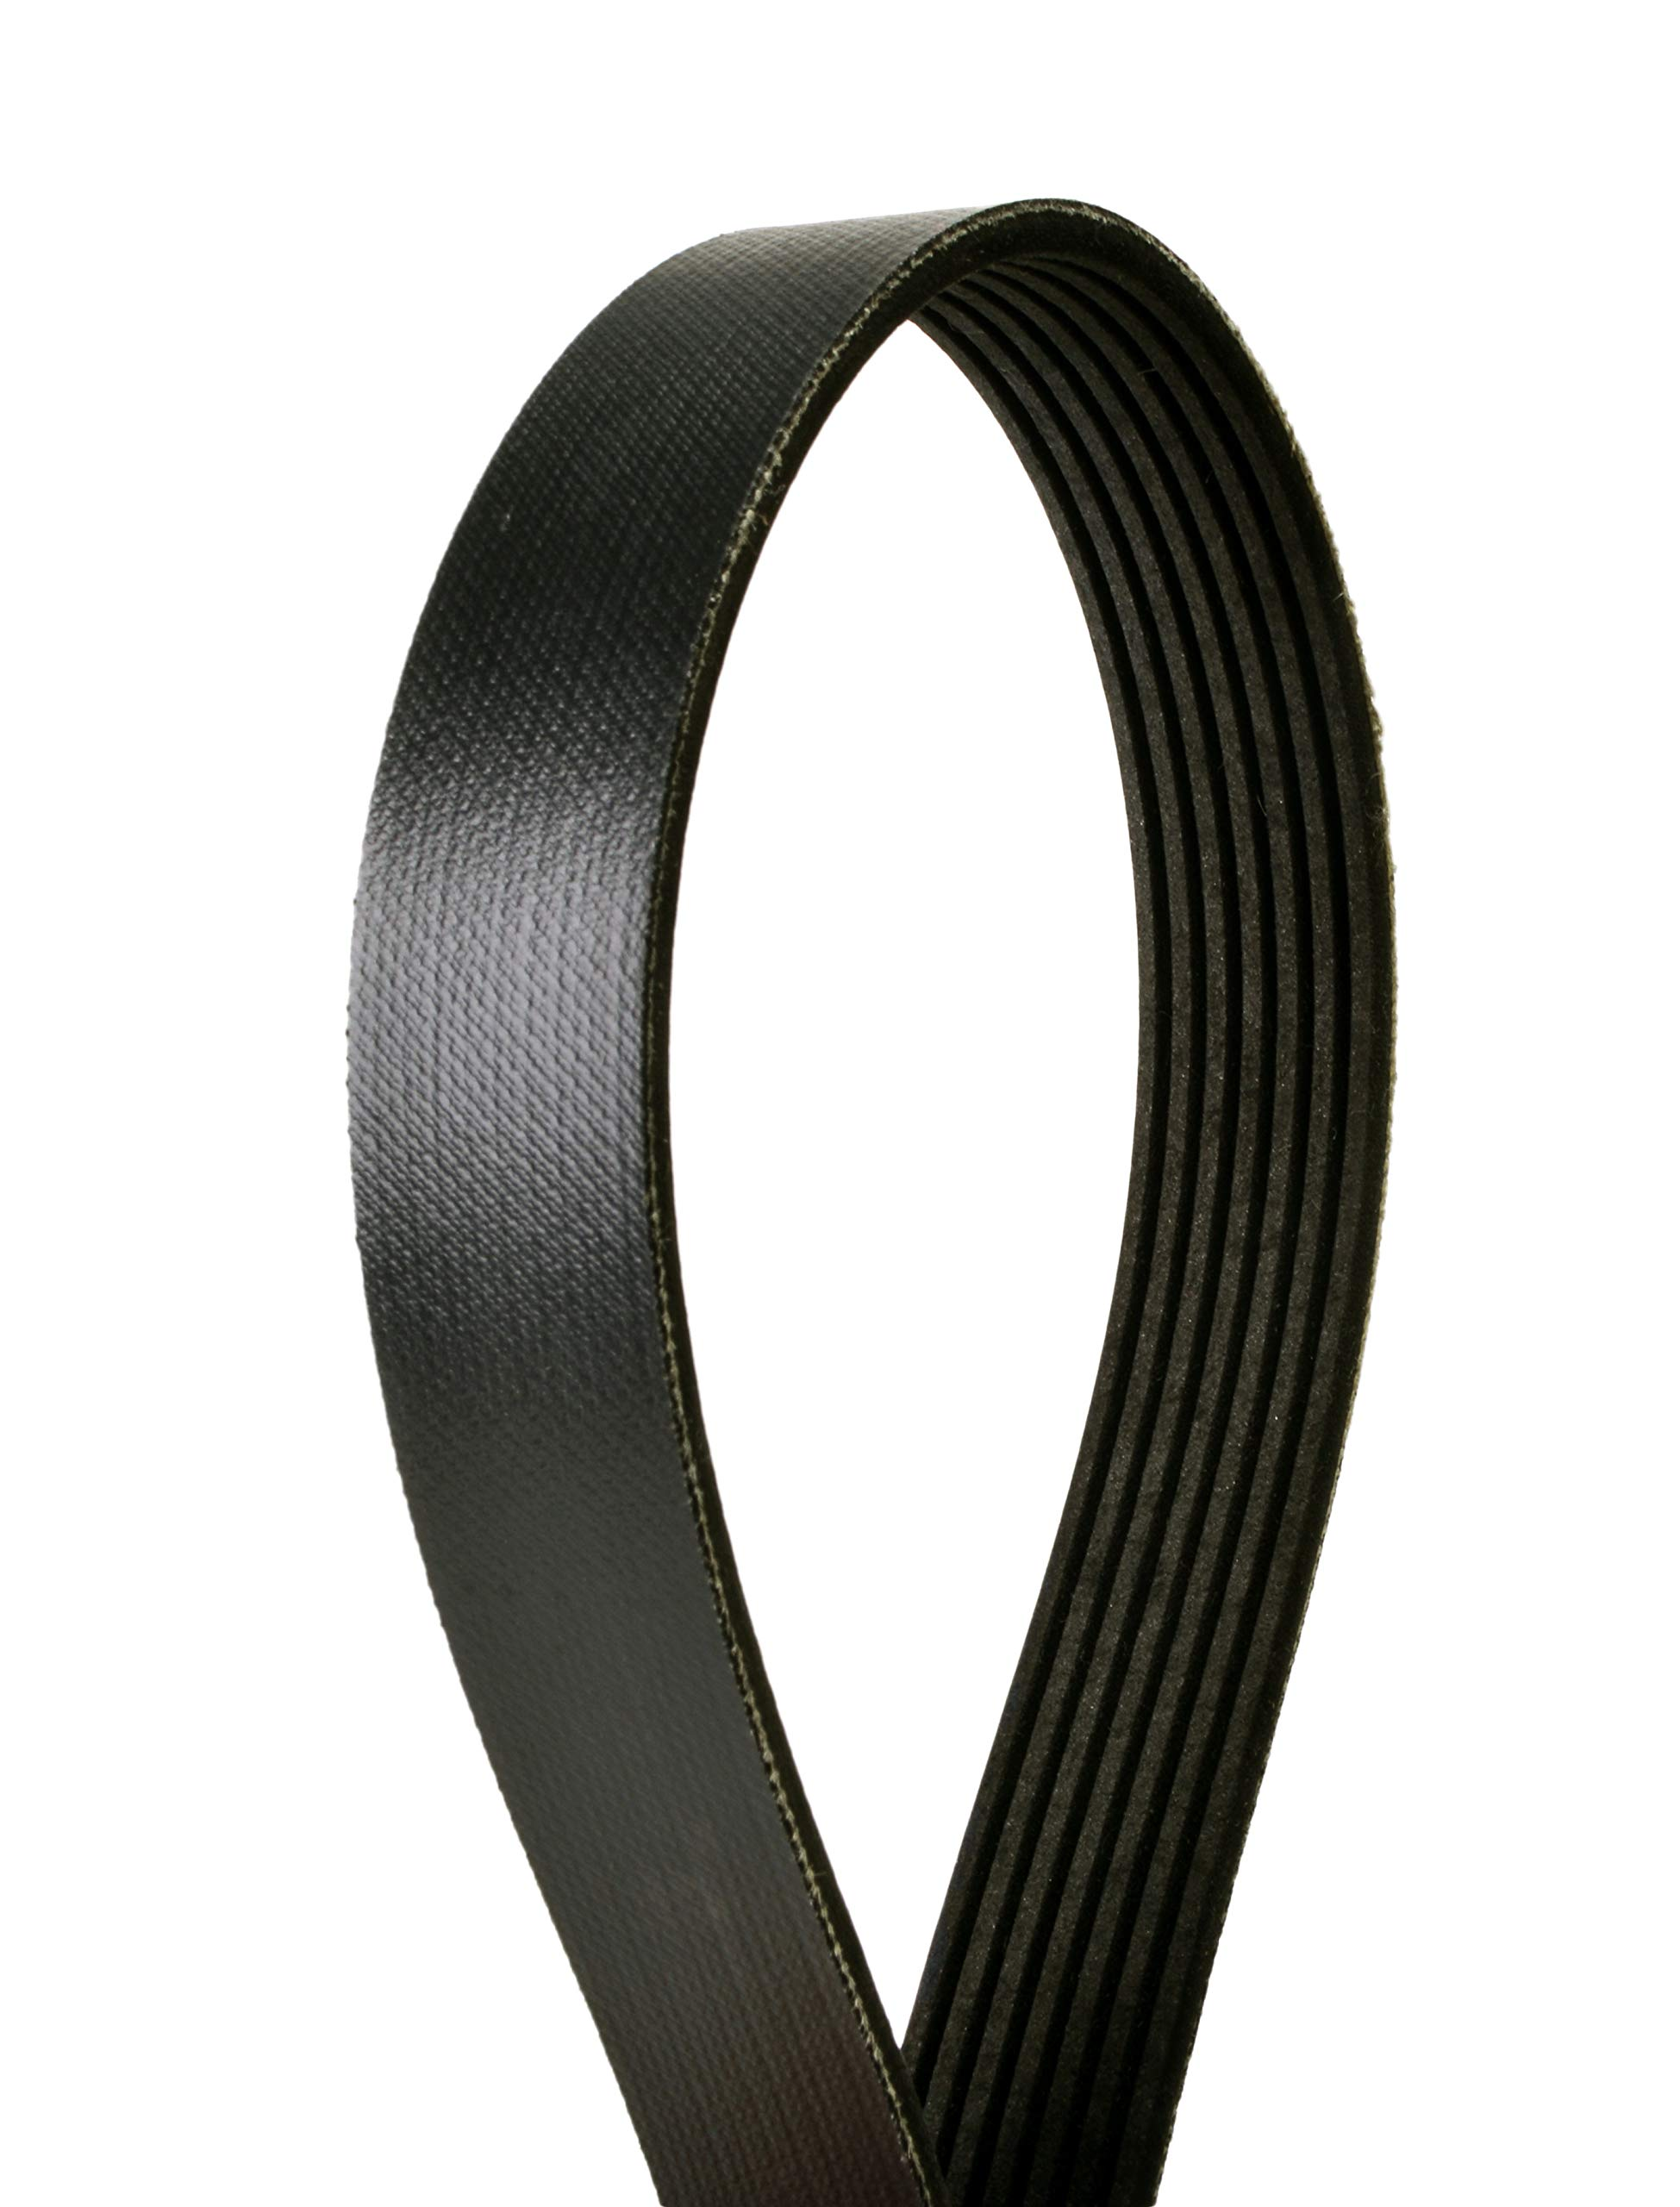 "Continental OE Technology Series 4070443 7-Rib, 44.3"" Multi-V Belt"